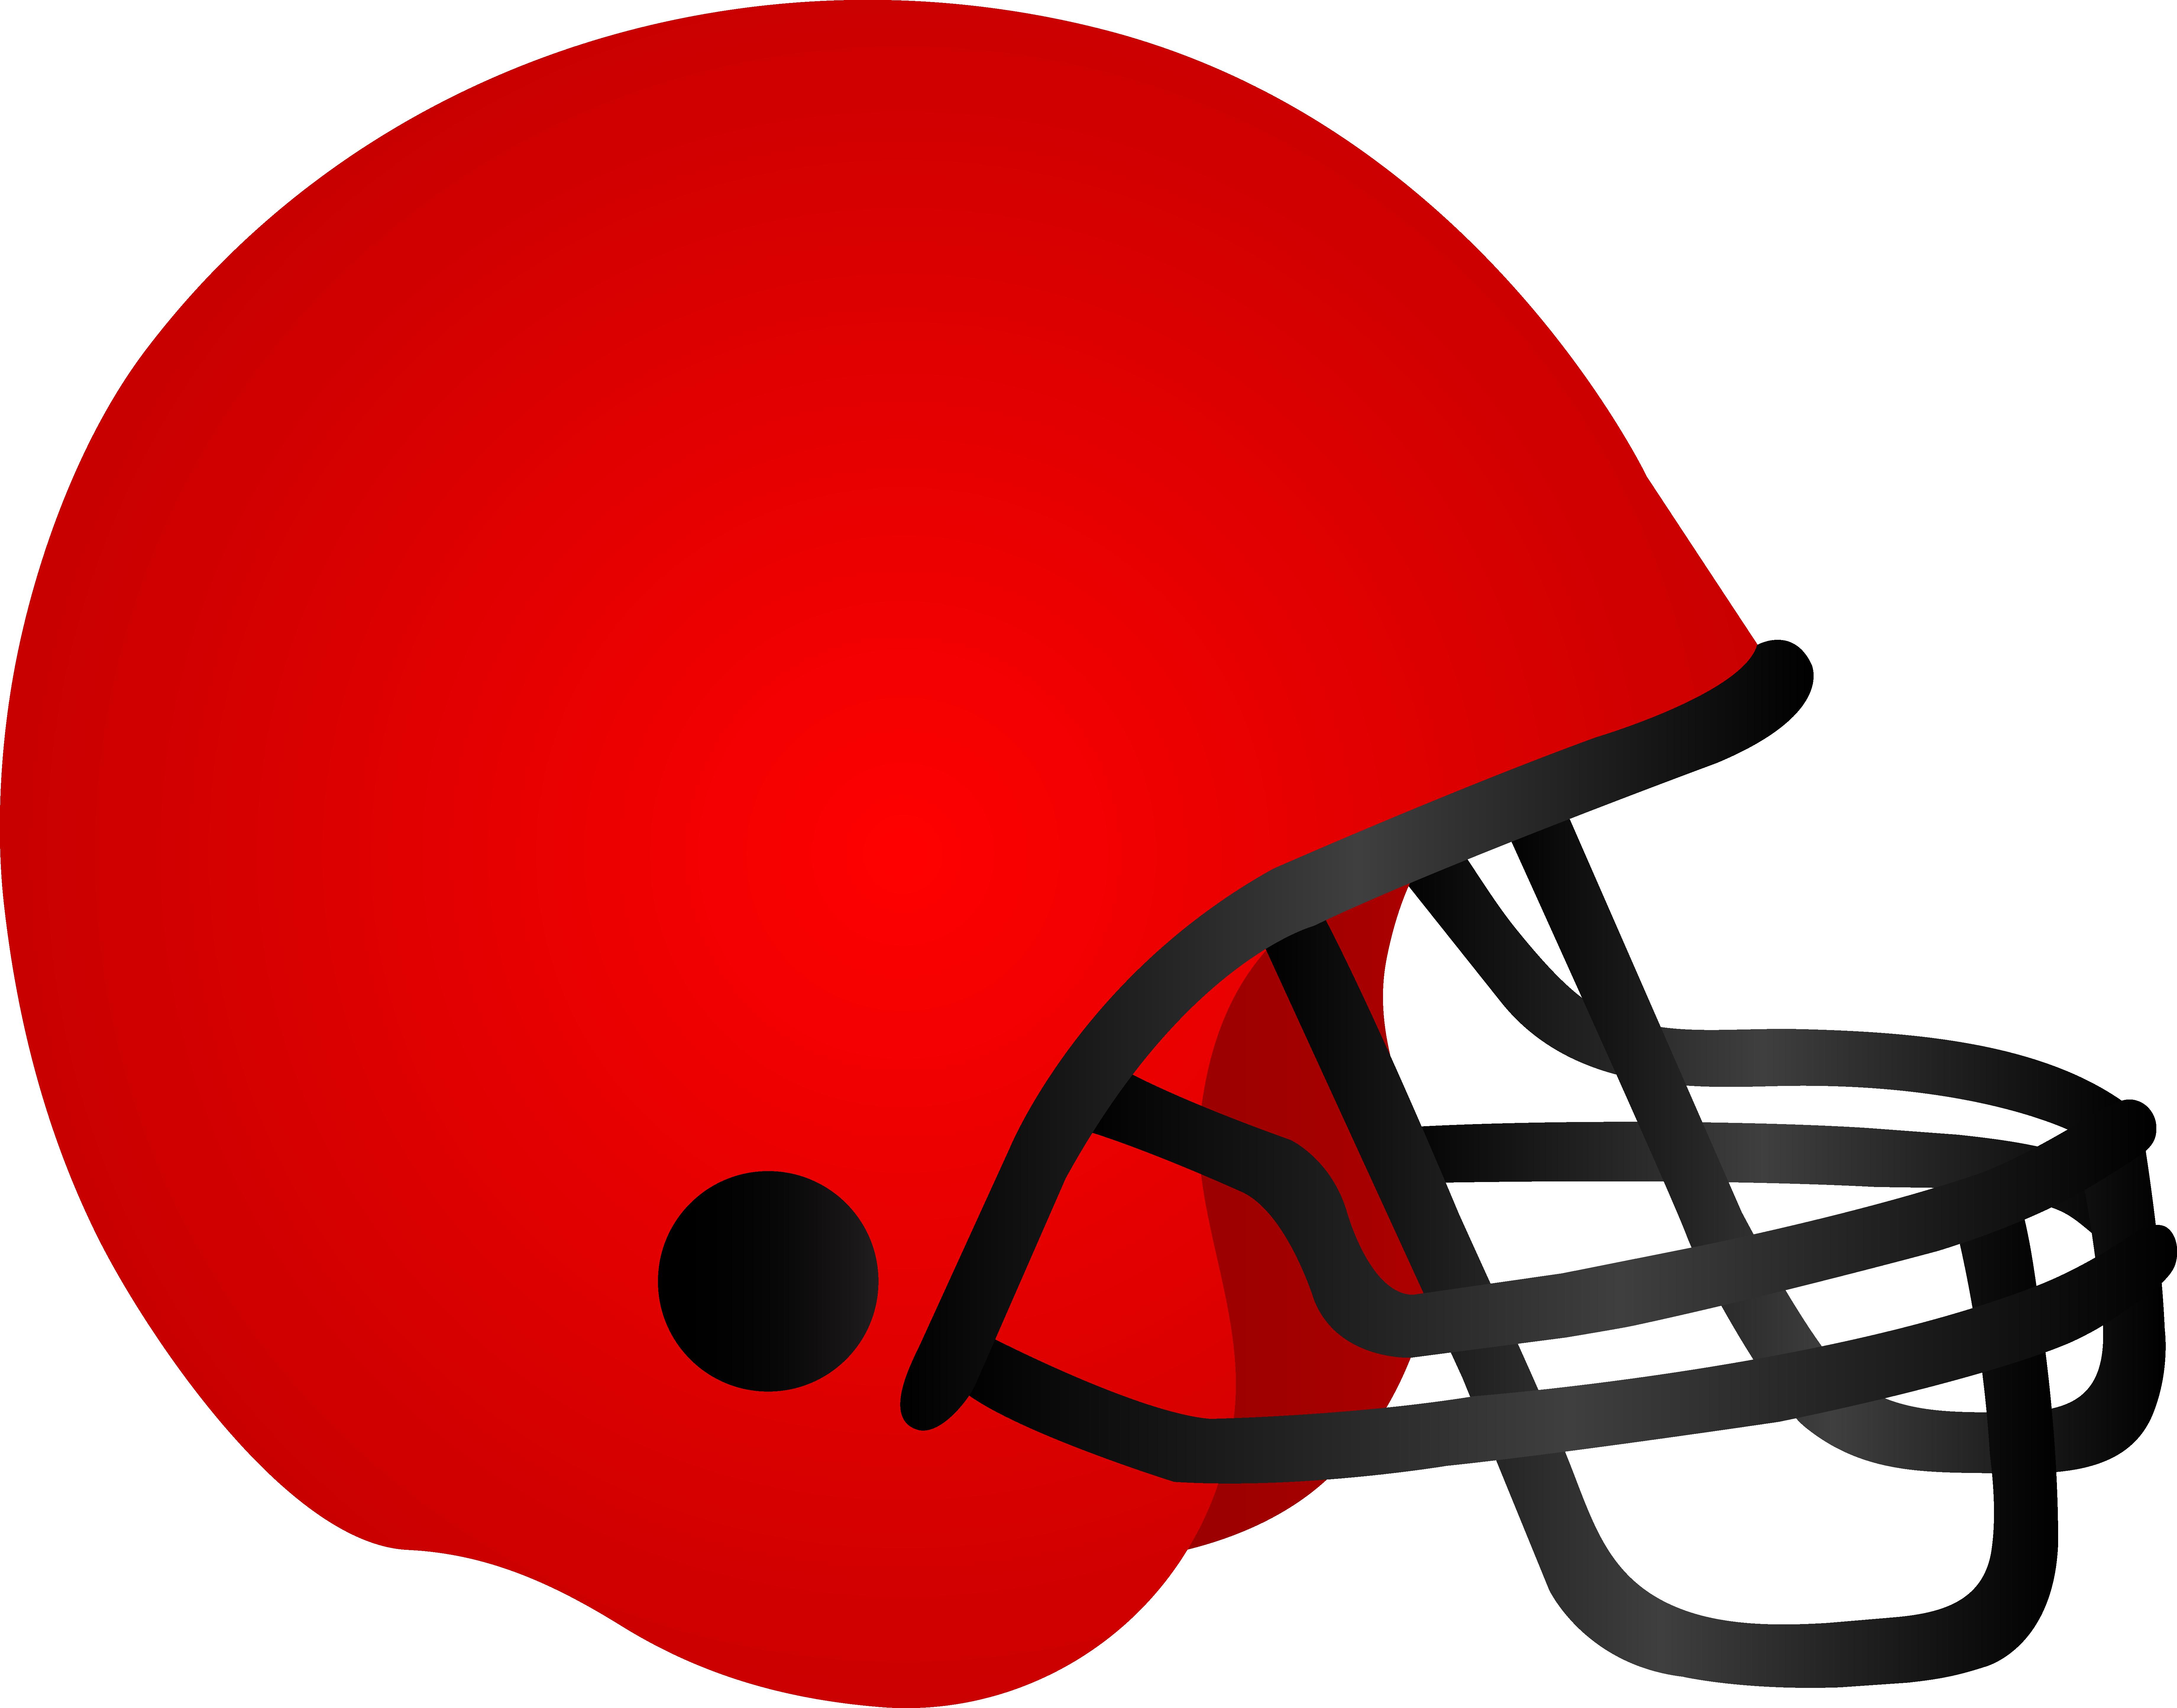 Ball clipart football helmet Clipart Images Panda Free Clipart